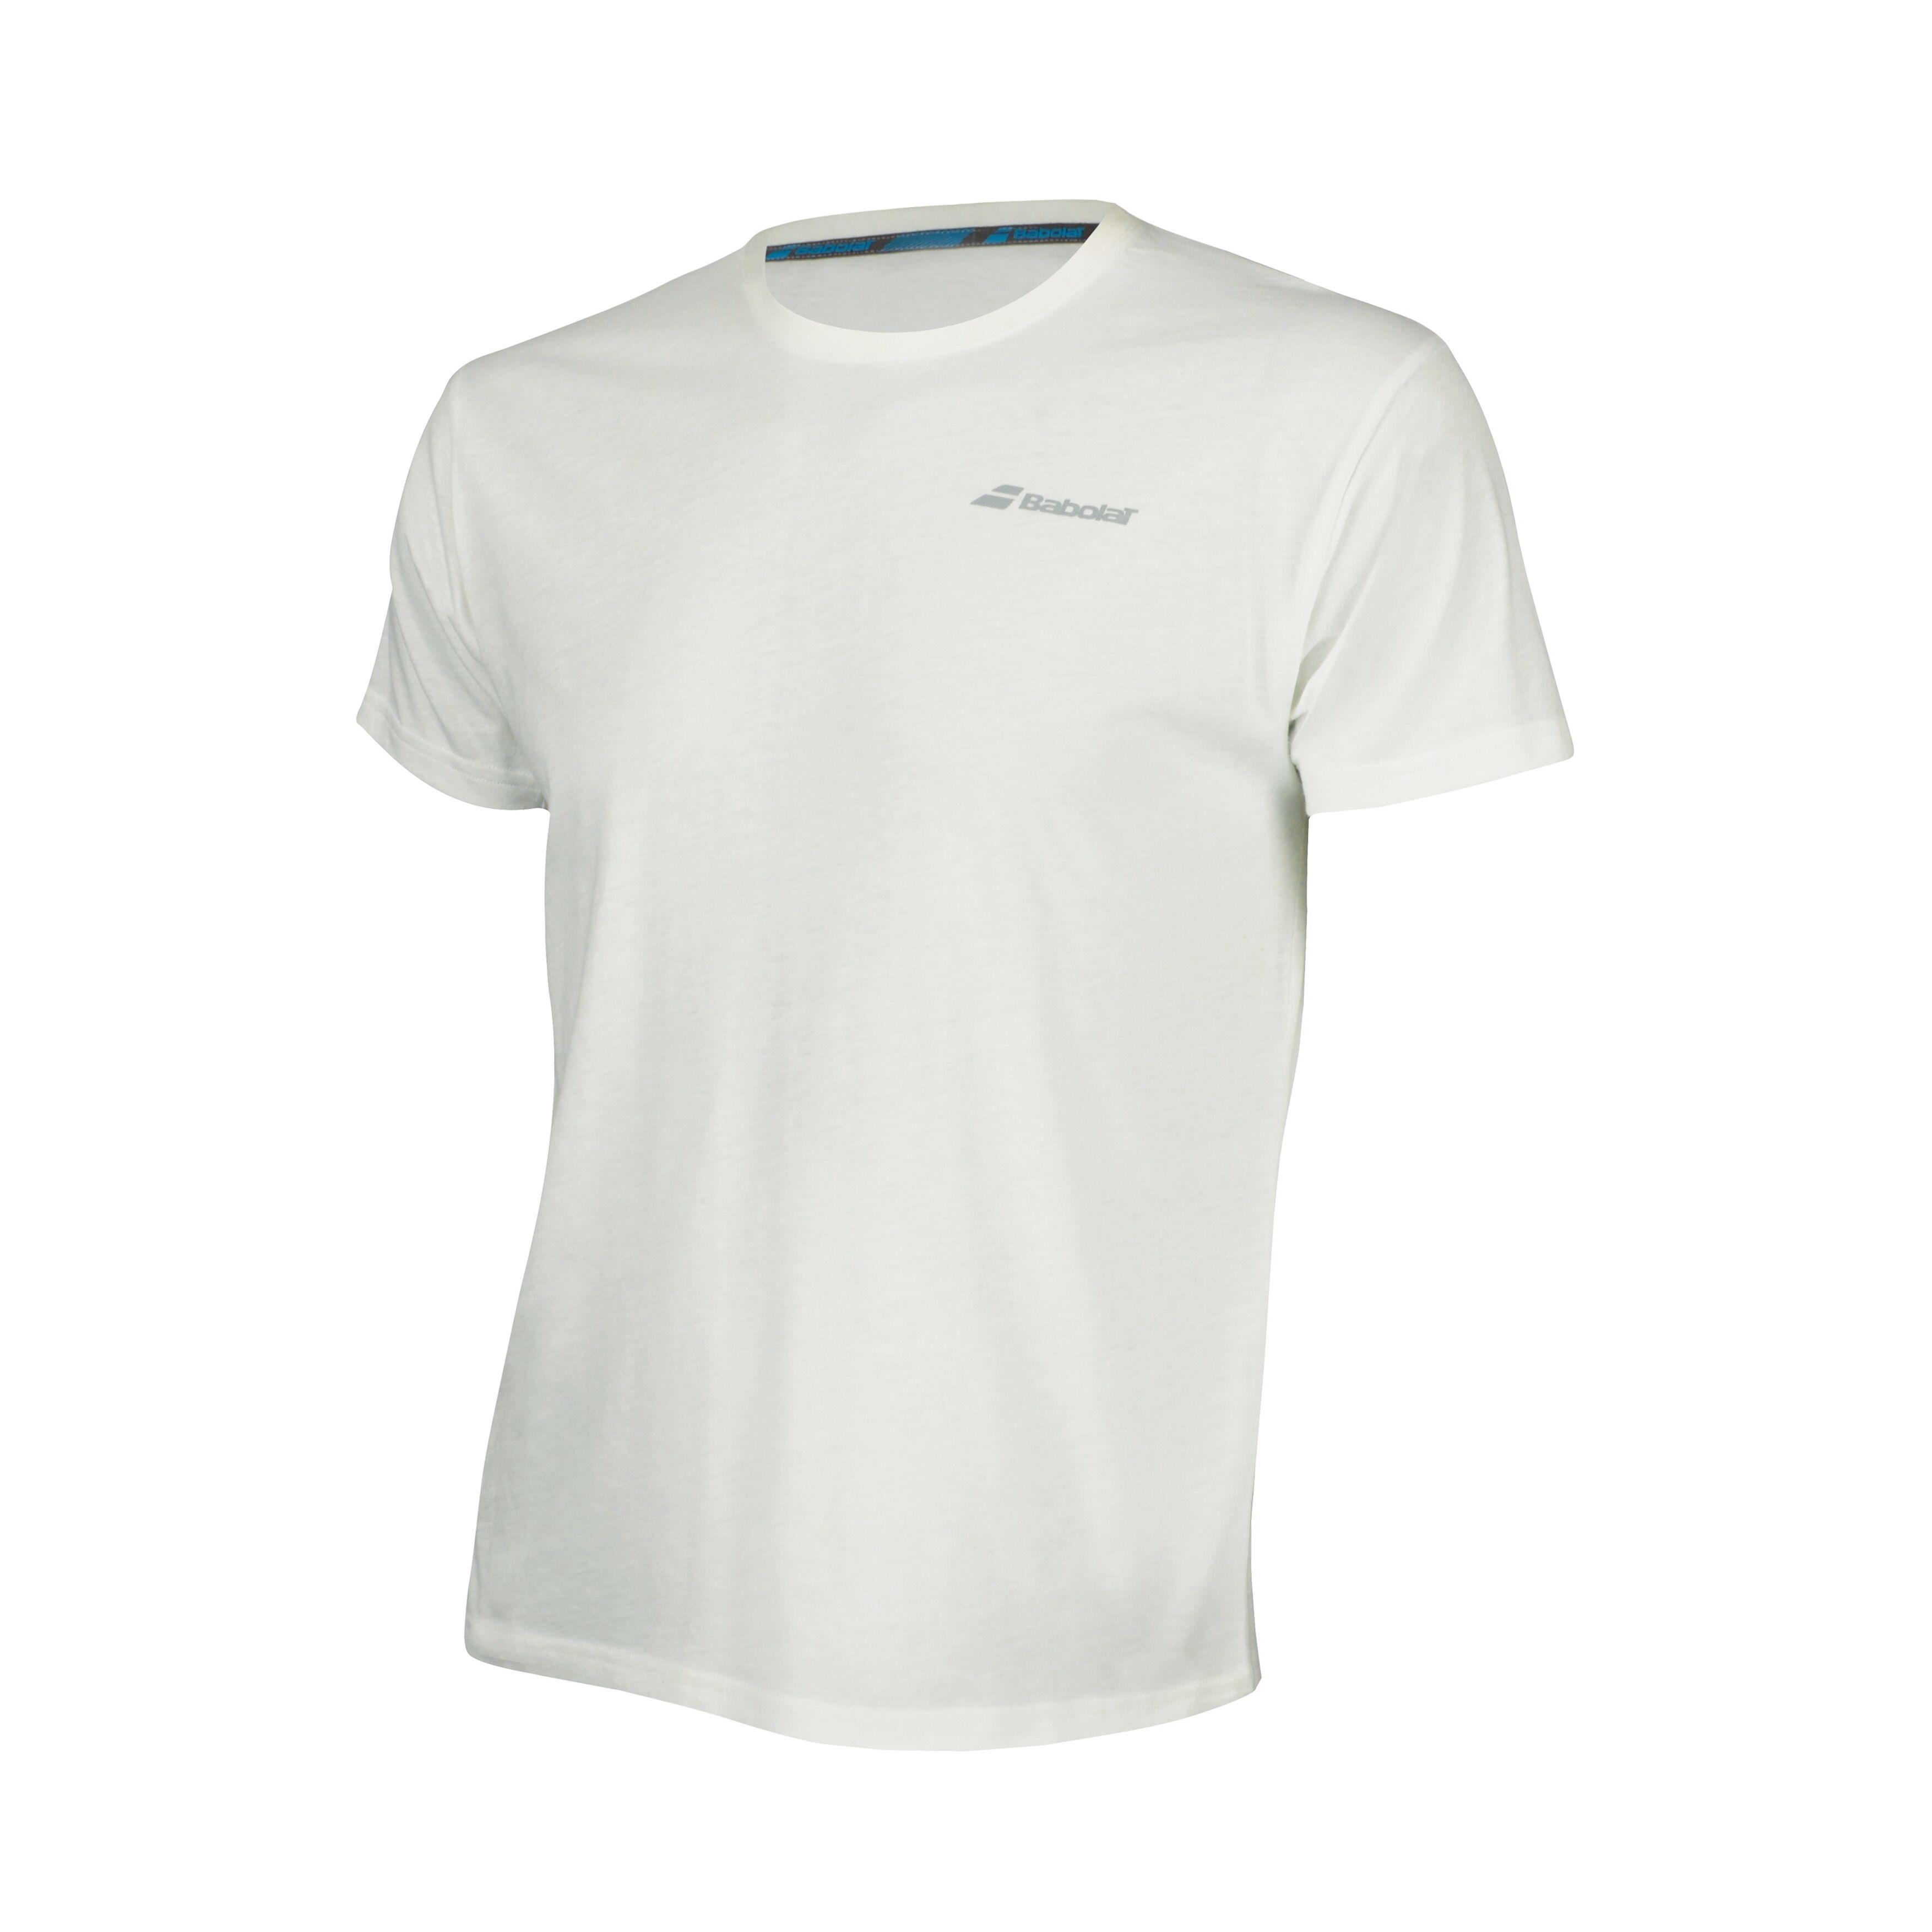 Babolat Core Tee-Shirt Boy White 140